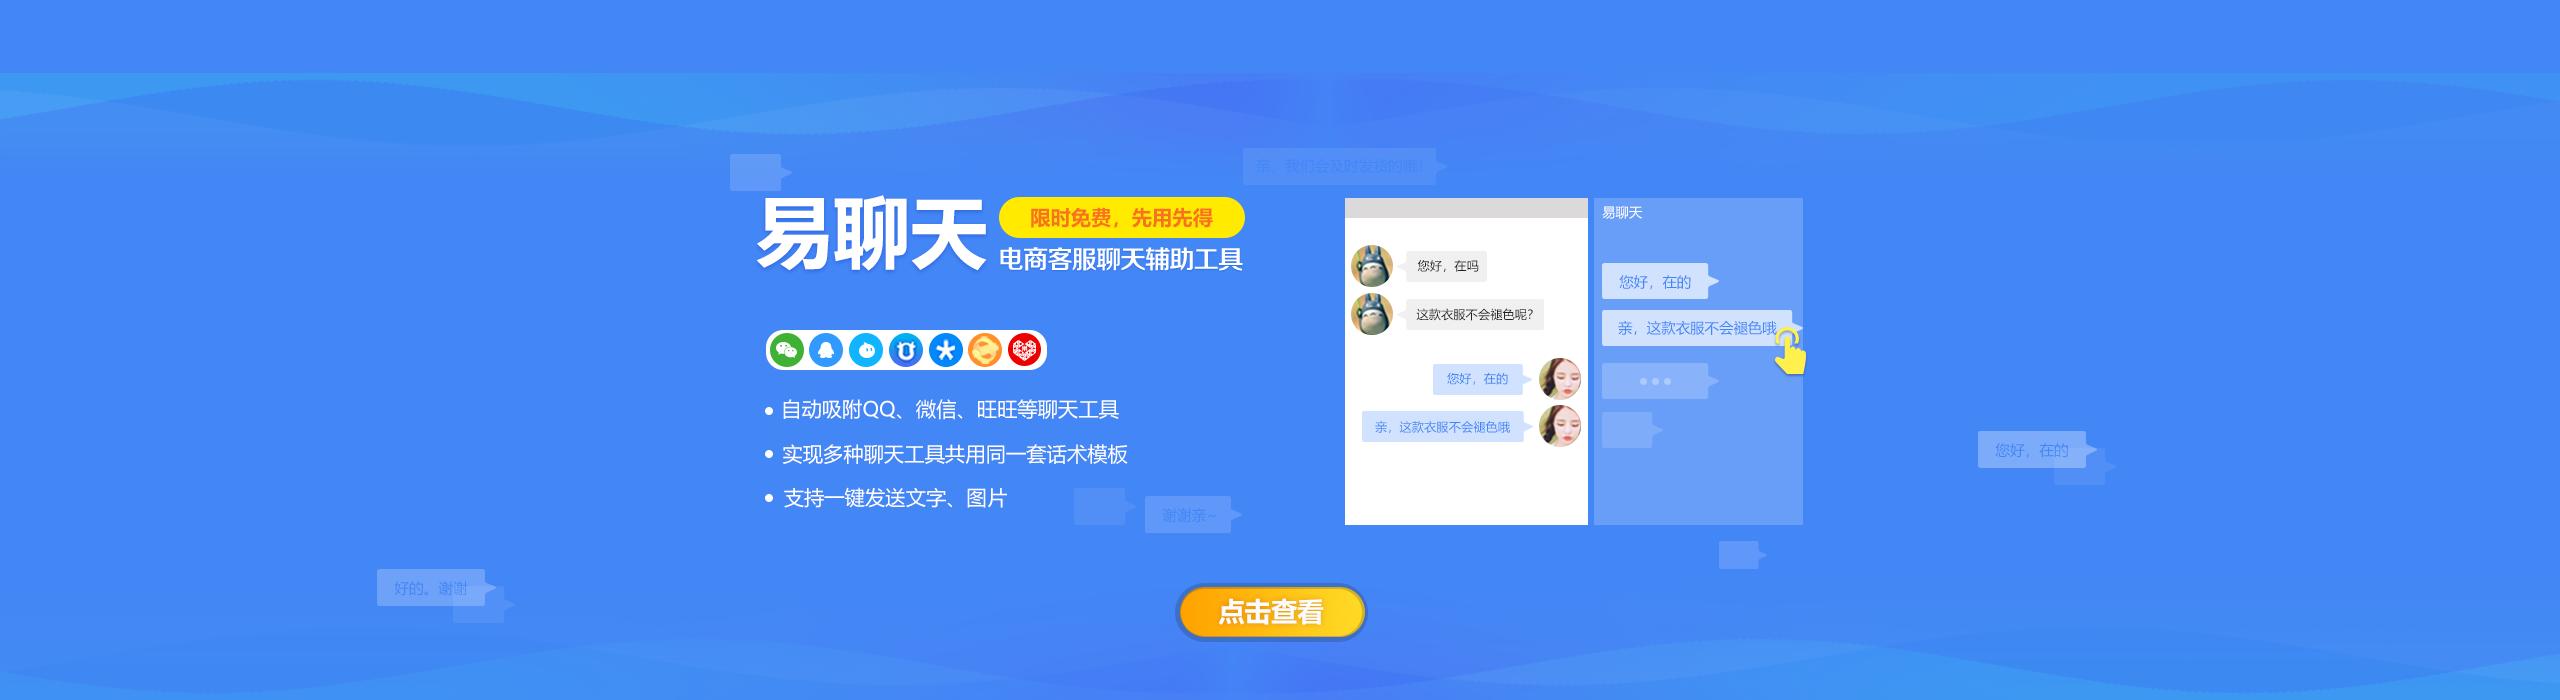 易聊天官網banner2560